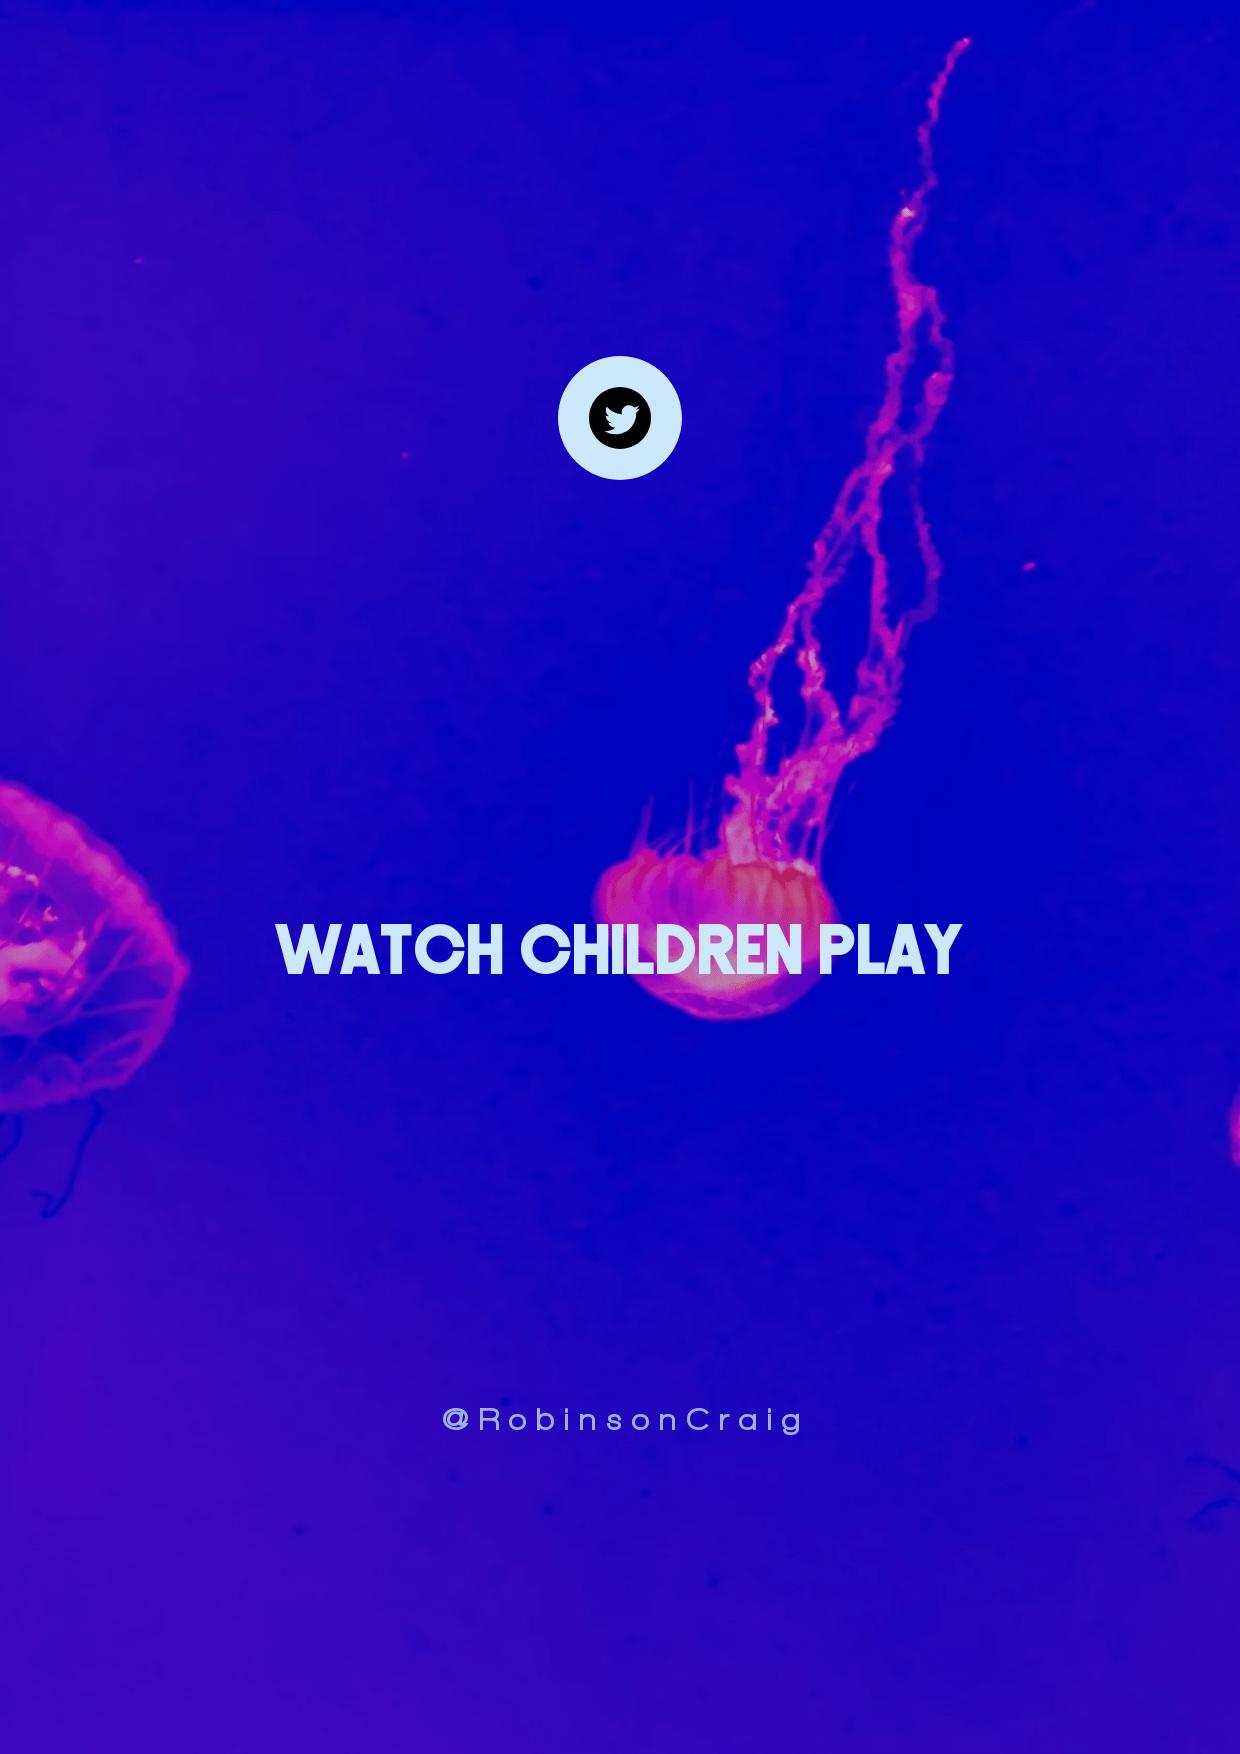 Jellyfish,                Cnidaria,                Marine,                Invertebrates,                Invertebrate,                Violet,                Organism,                Sky,                Atmosphere,                Biology,                Computer,                Wallpaper,                Twitter,                 Free Image